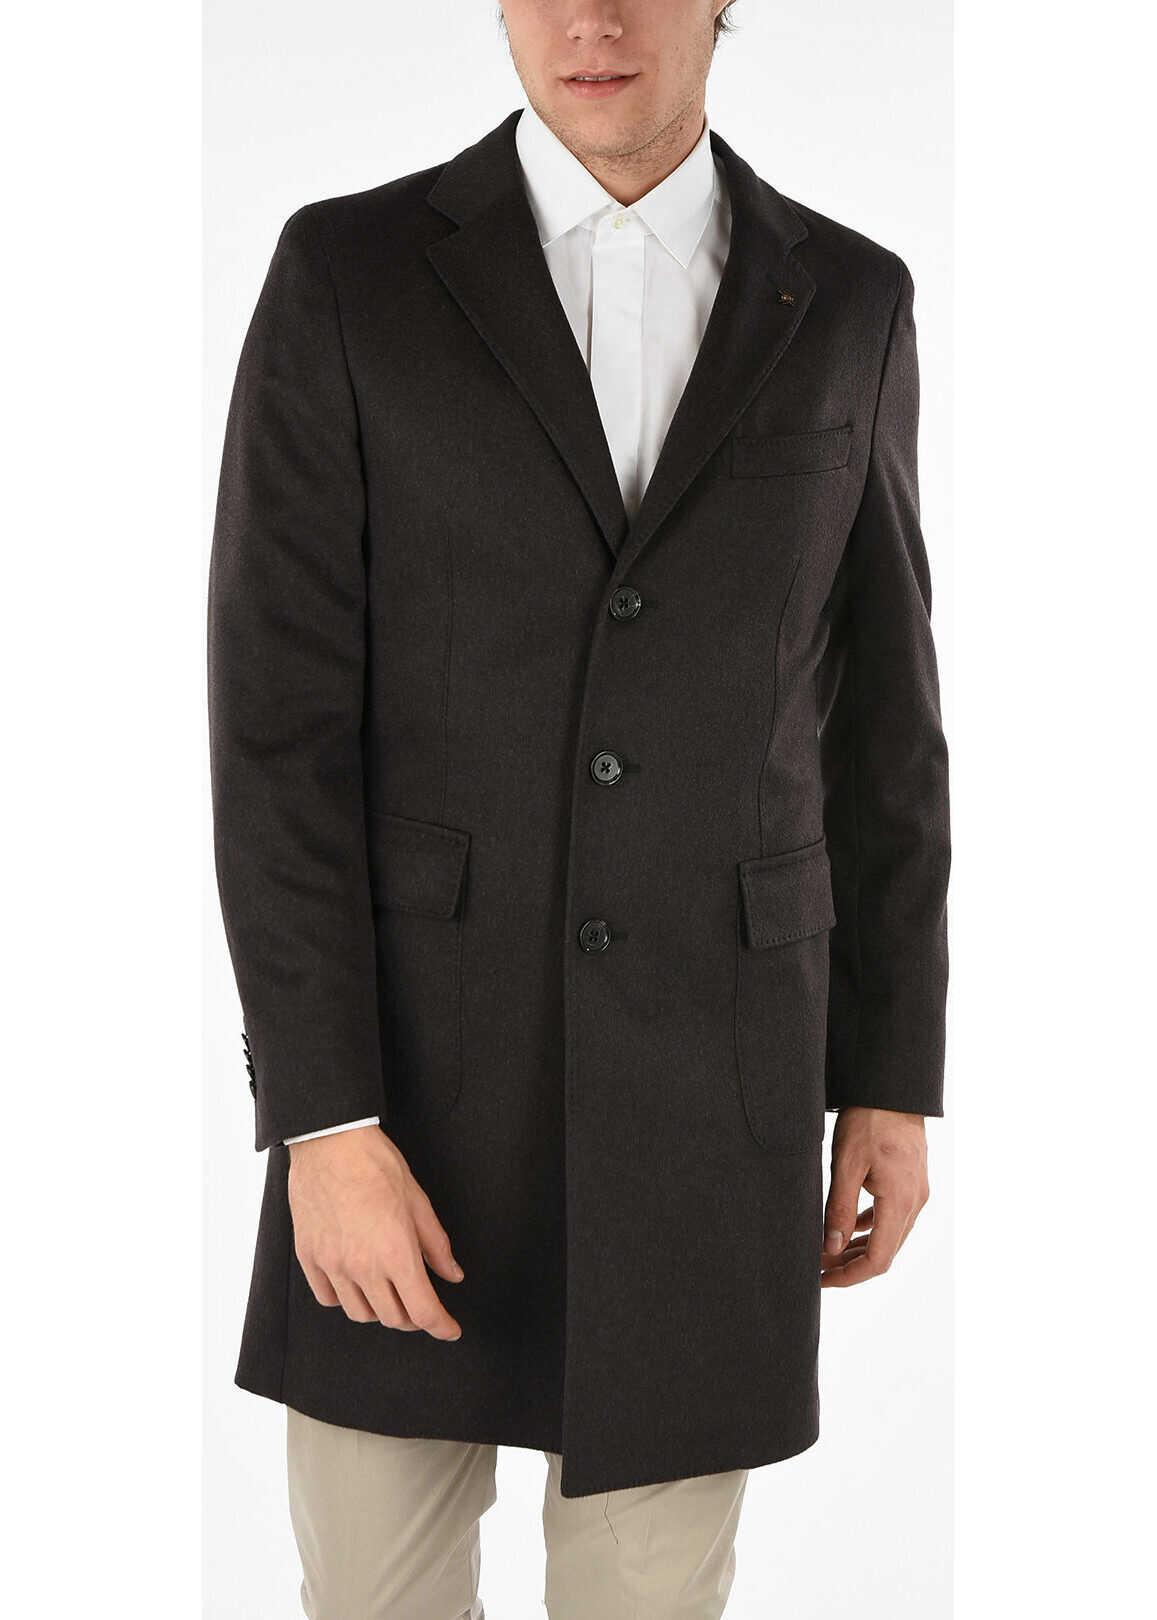 CORNELIANI CC COLLECTION Cashmere 3 Button Chesterfield Coat BROWN